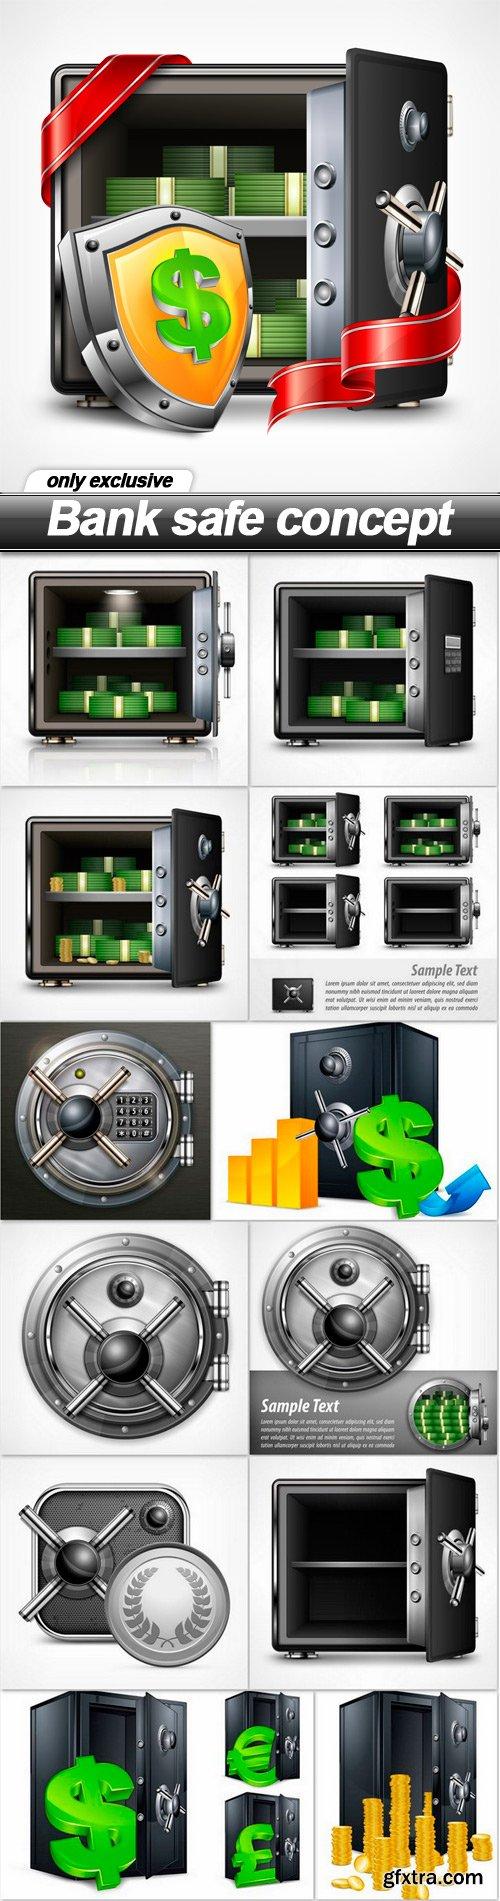 Bank safe concept - 13 EPS